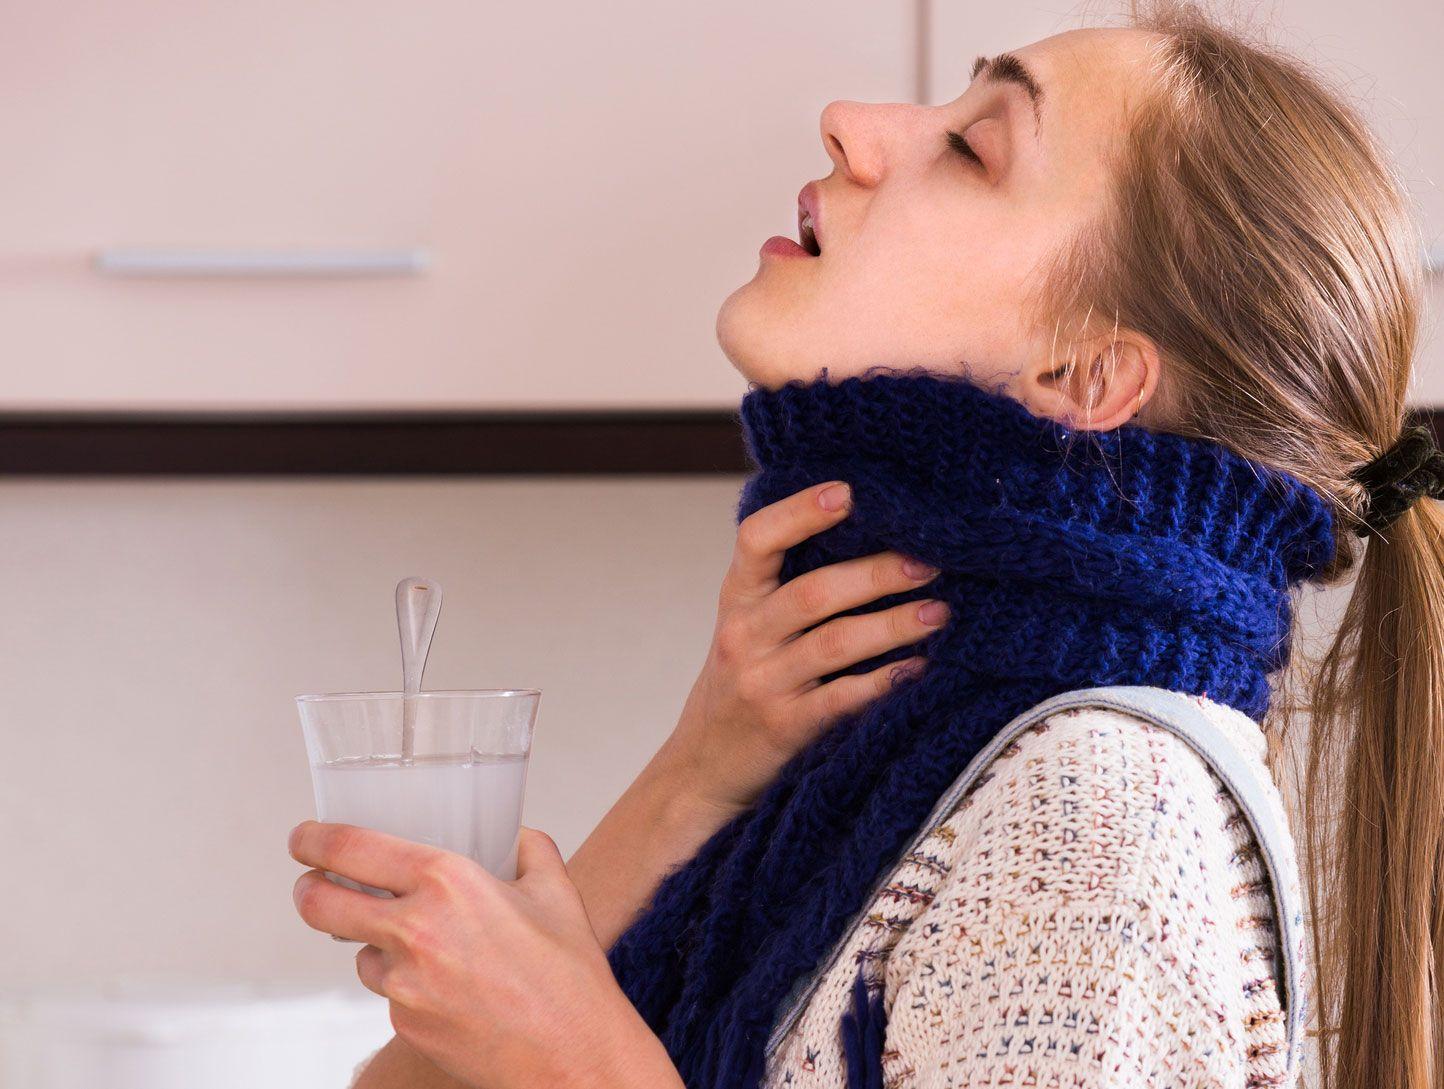 gargarisme contre l'angine